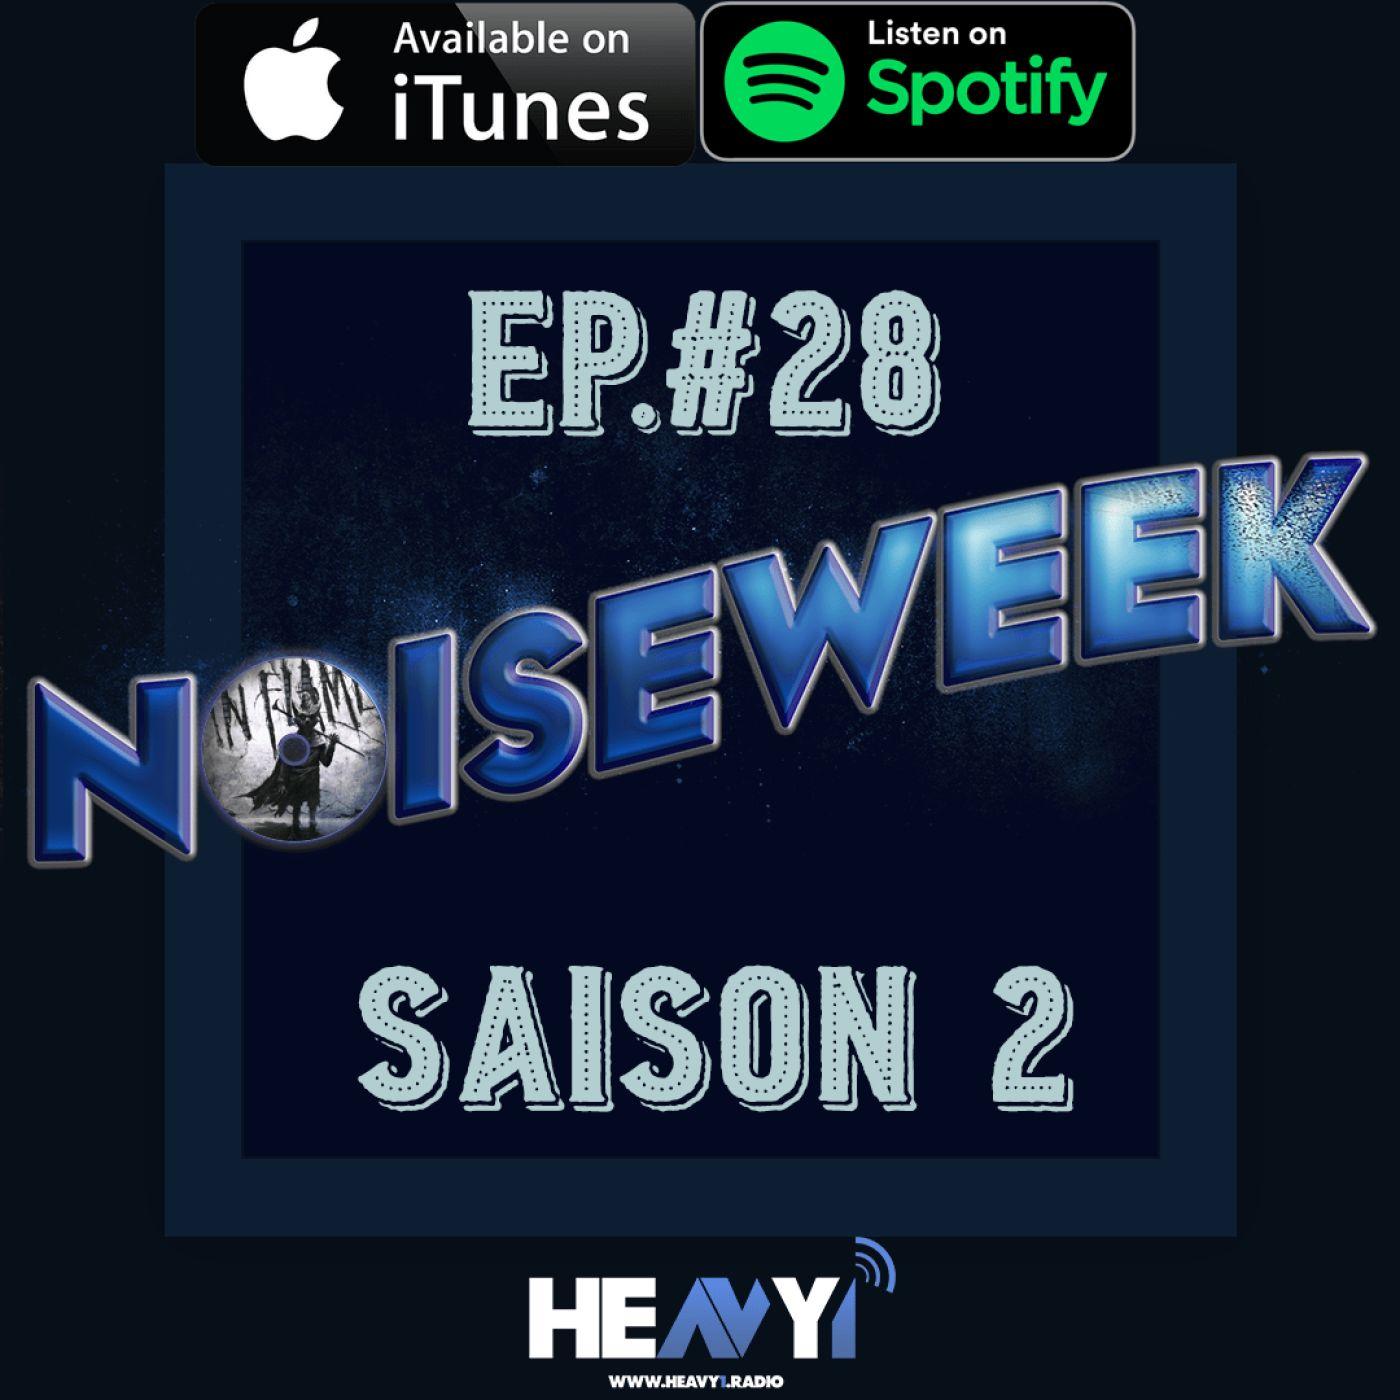 Noiseweek #28 Saison 2